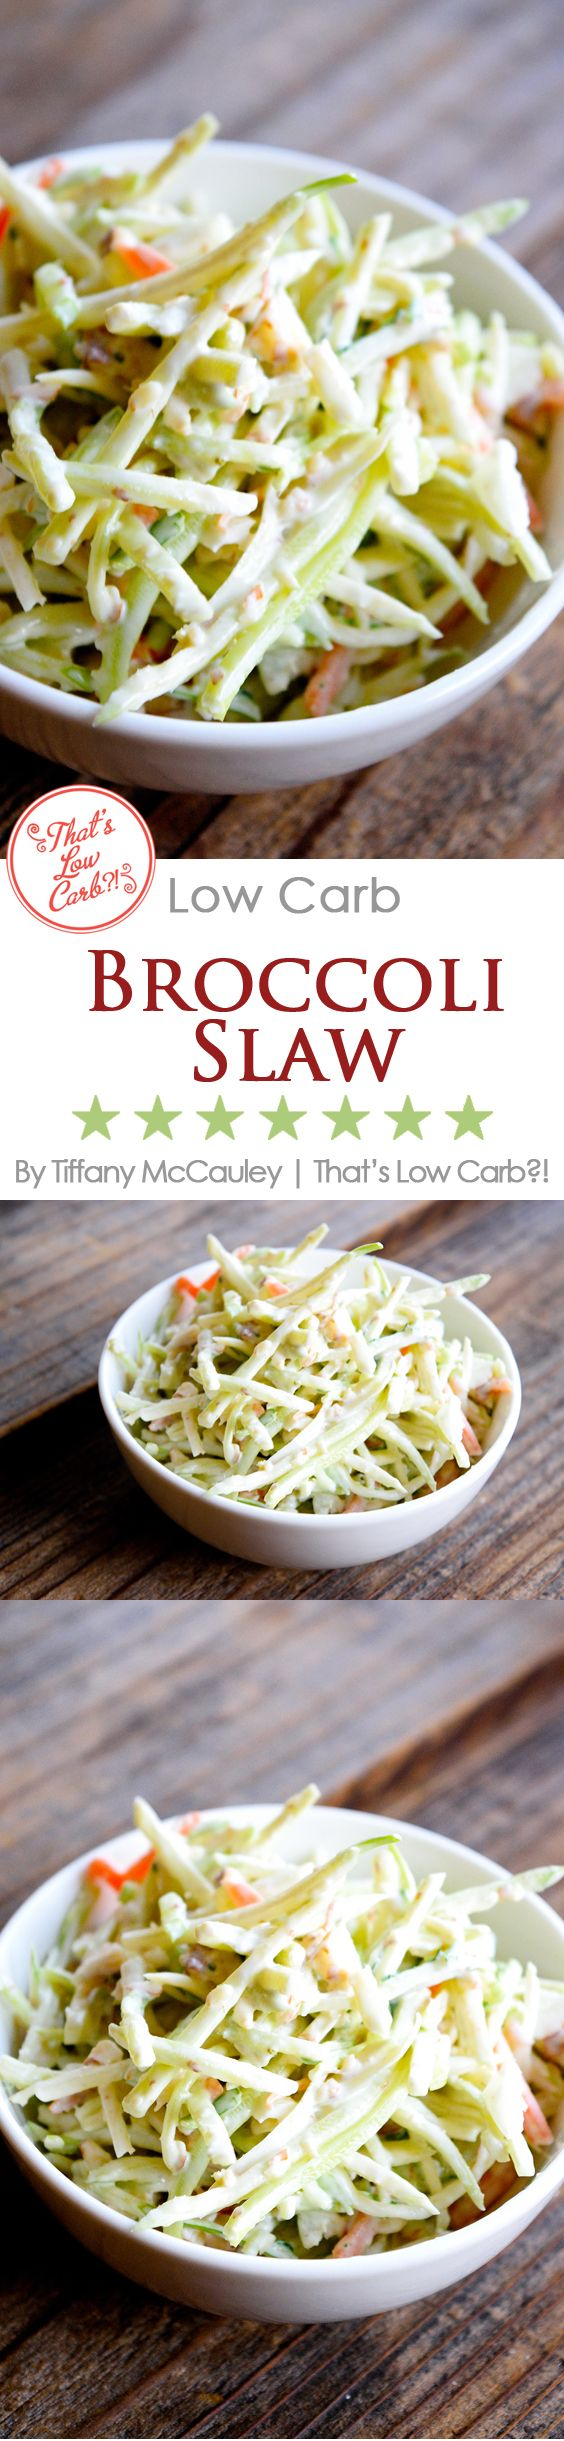 Low Carb Recipes   Low Carb Broccoli Slaw Recipe   Low Carb Side Dishes   Low Carb   Recipes ~ http://www.thatslowcarb.com